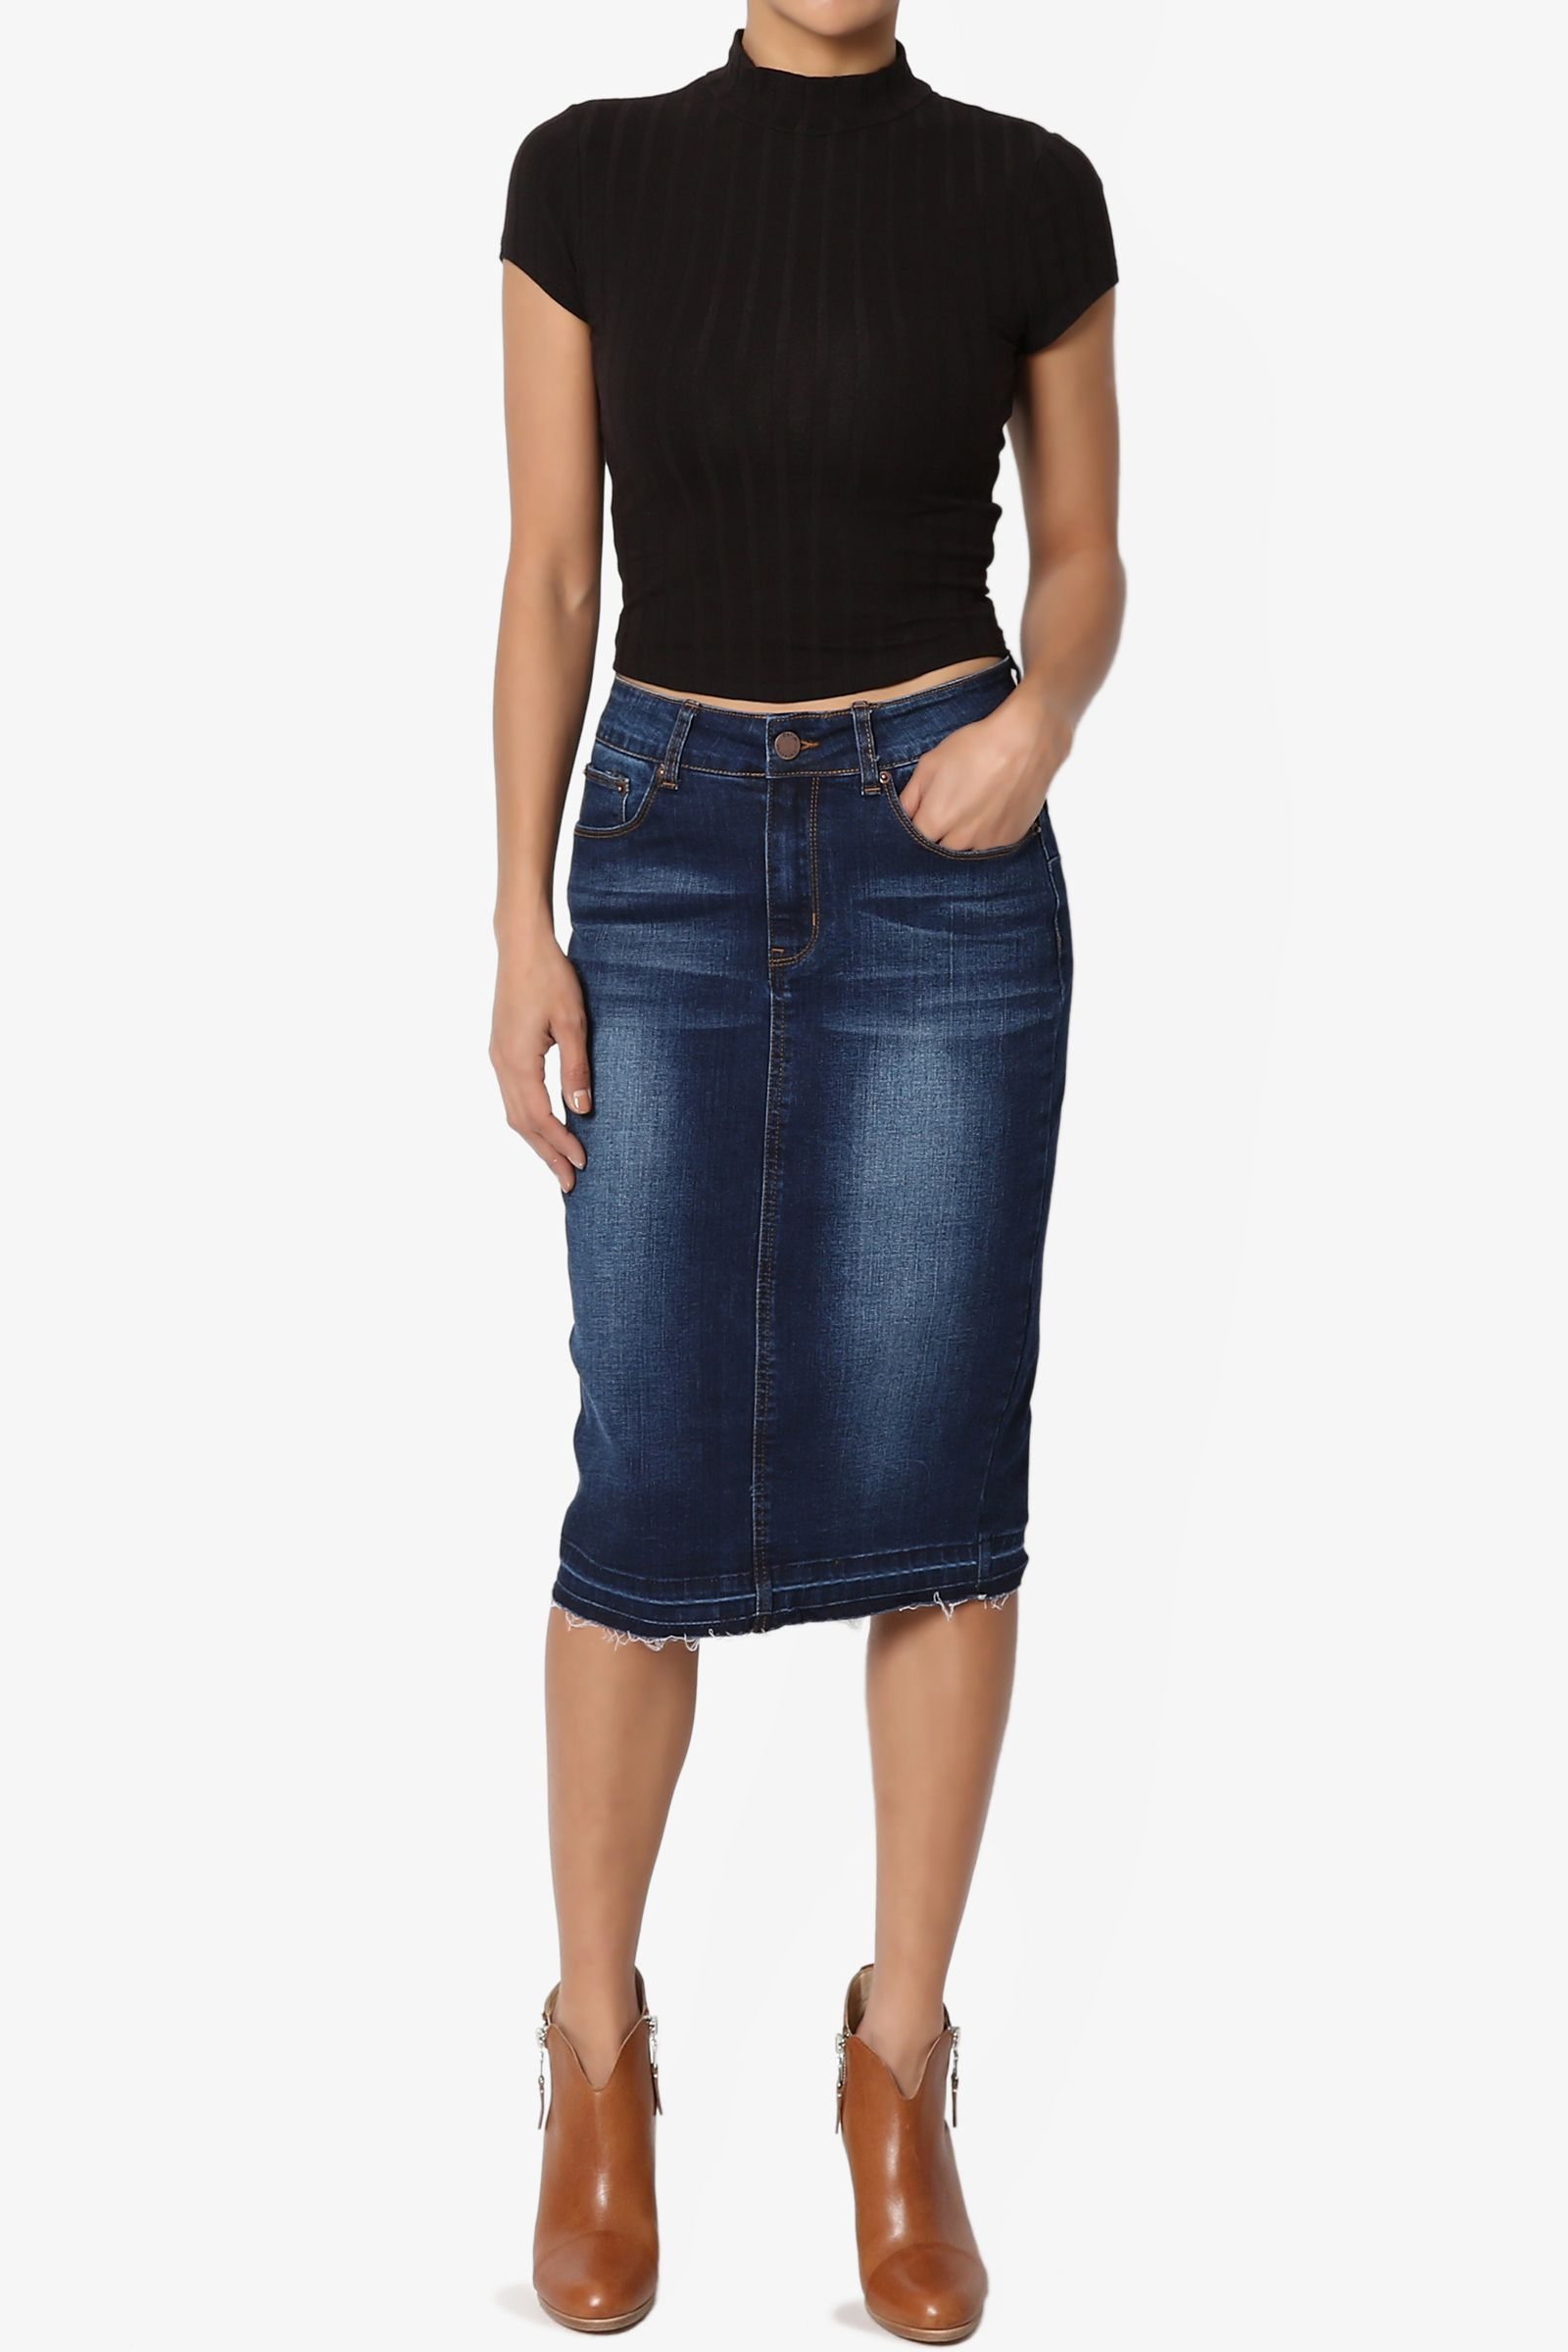 493524a95137 TheMogan Women's Butt Lift Washed Blue Jean Pencil Midi Soft Denim Skirt# Lift, #Washed, #Blue